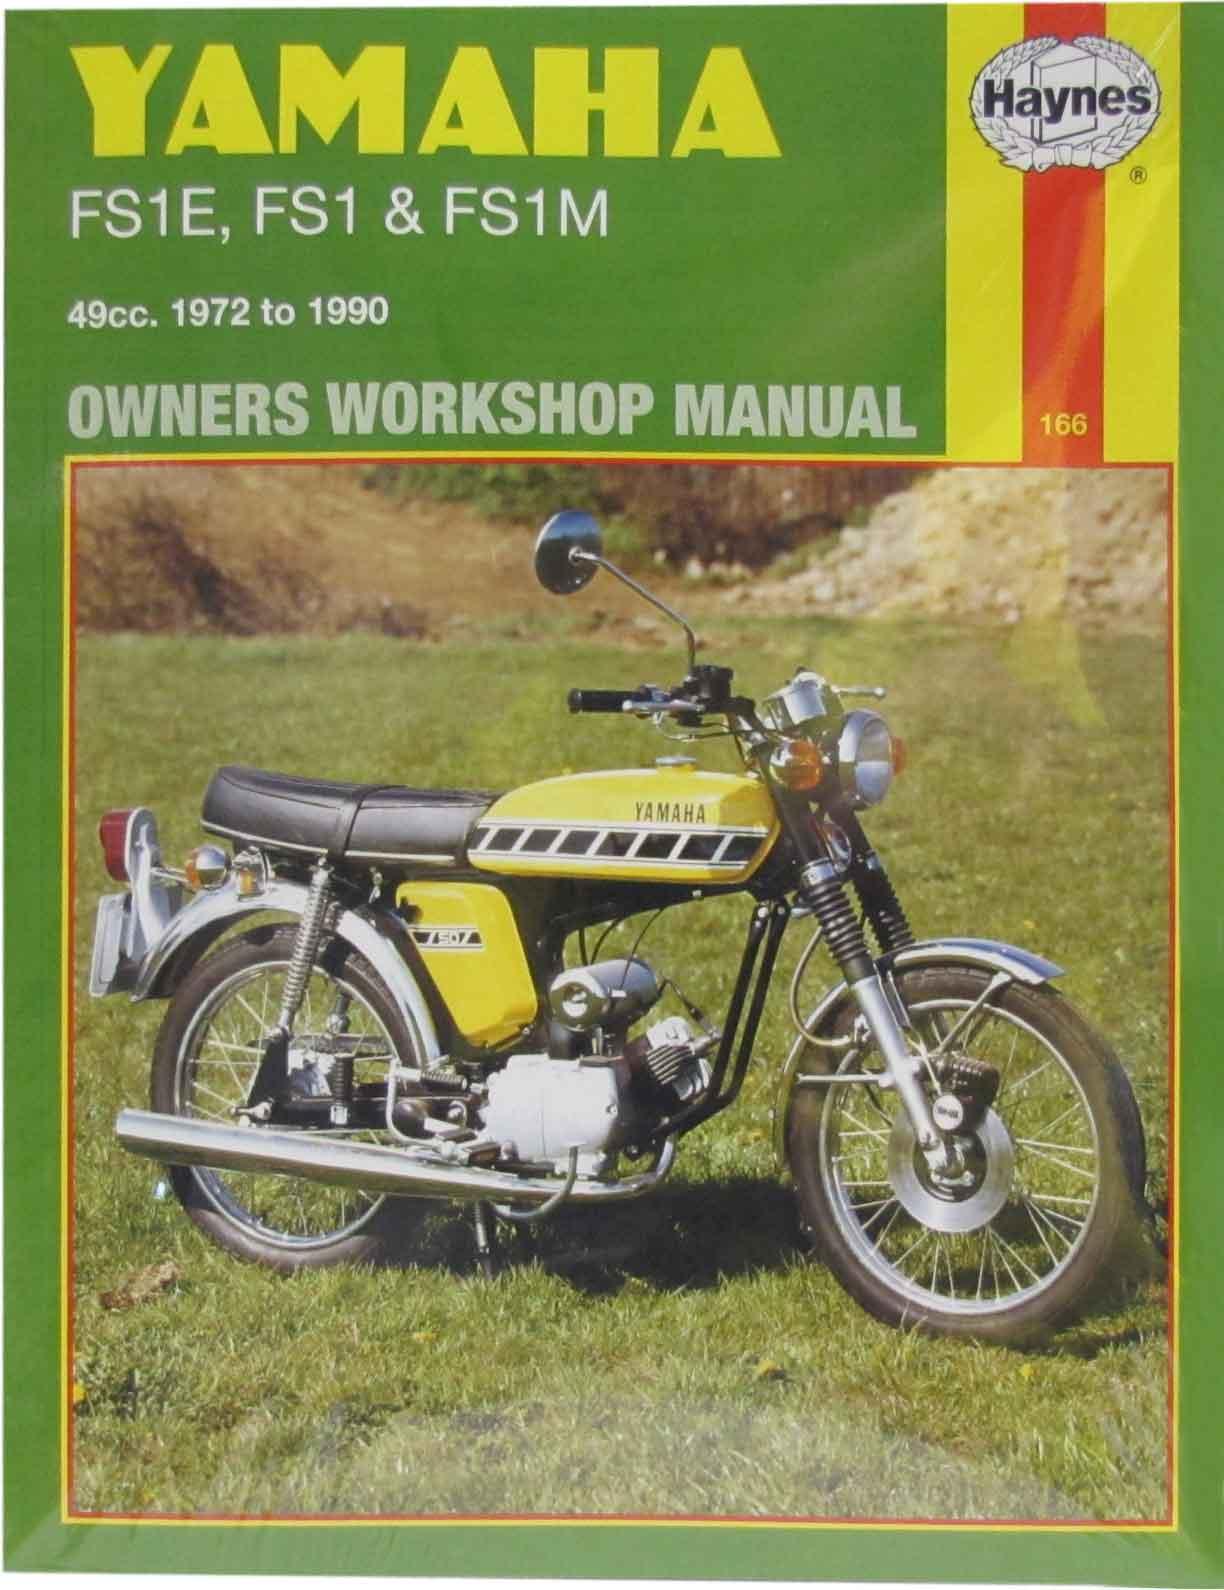 haynes manual yamaha fs1e all models each ebay rh ebay co uk yamaha fs1 manual yamaha fs1 manual pdf